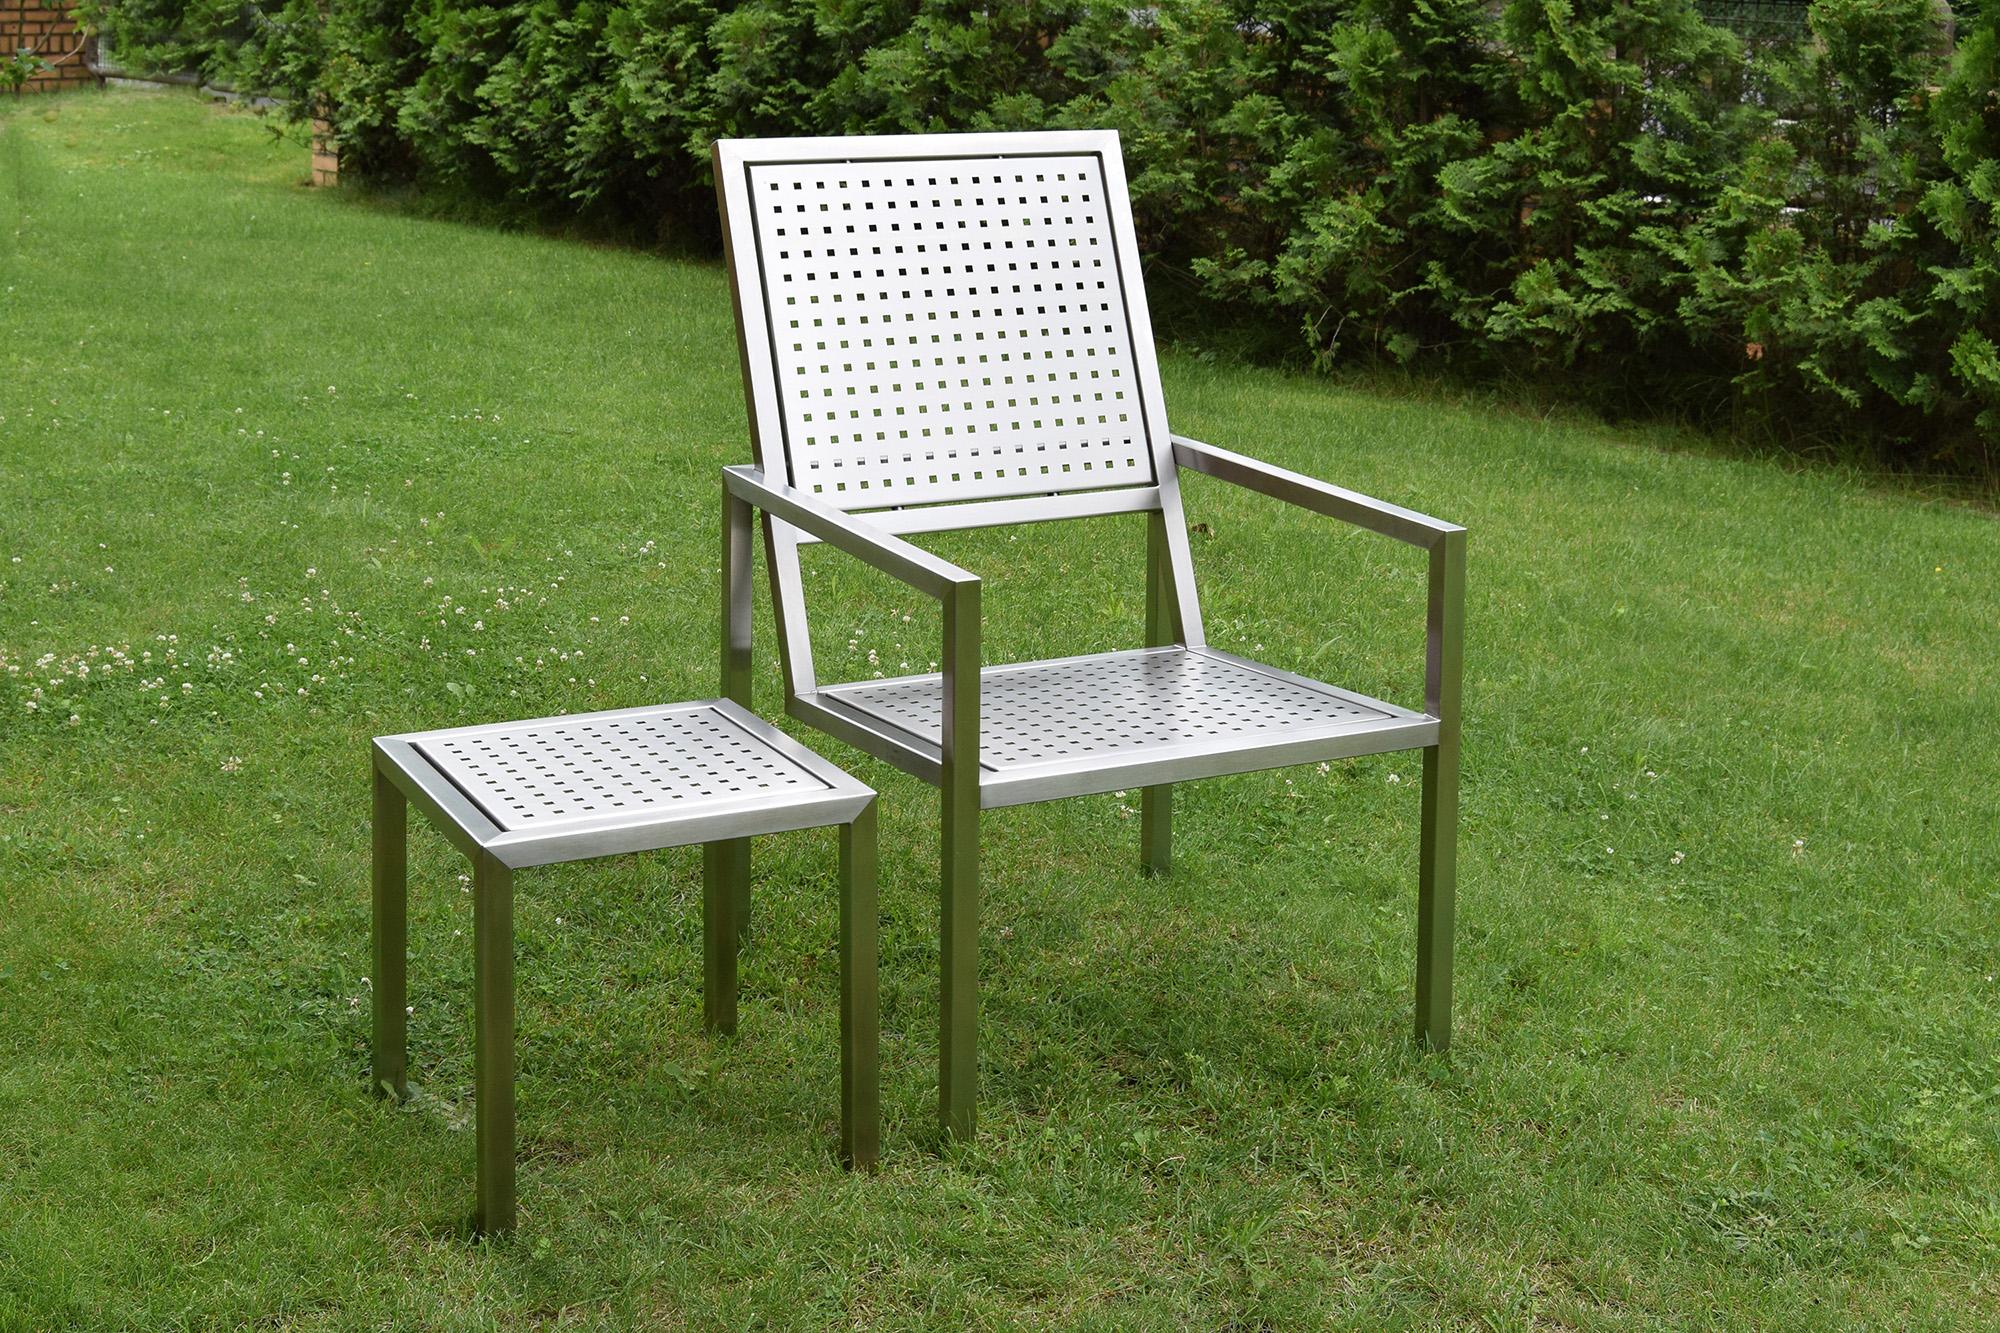 sessel f r rasen terrasse wintergarten balkon gartenmoebel. Black Bedroom Furniture Sets. Home Design Ideas